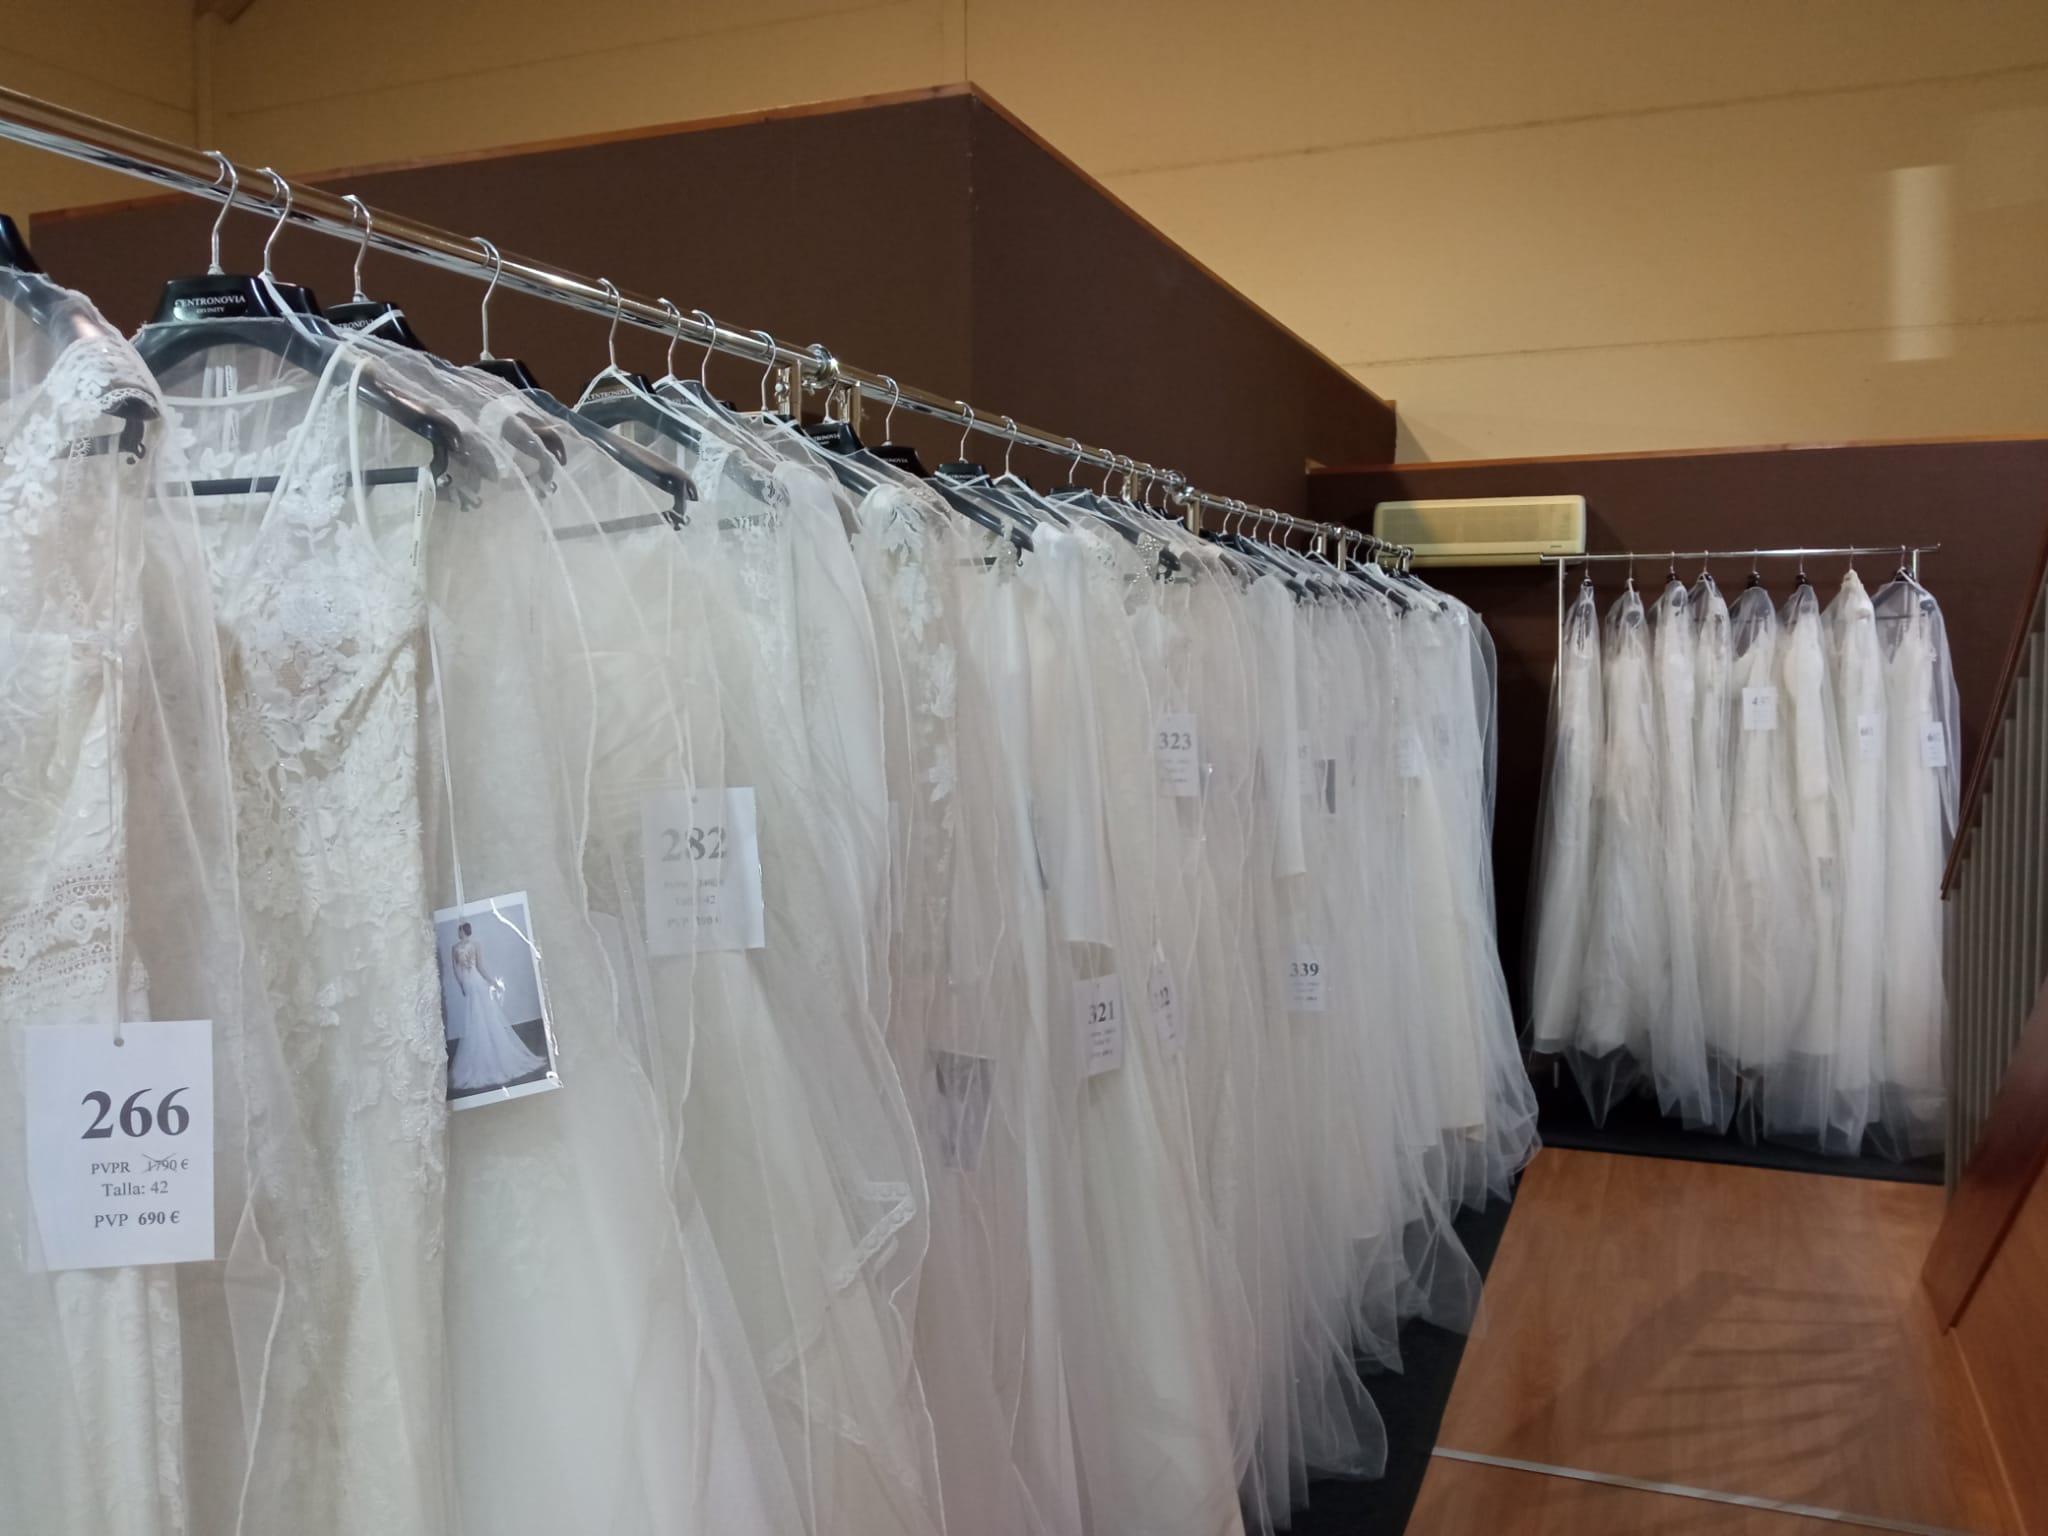 Divinity CentroNovia bridal gowns